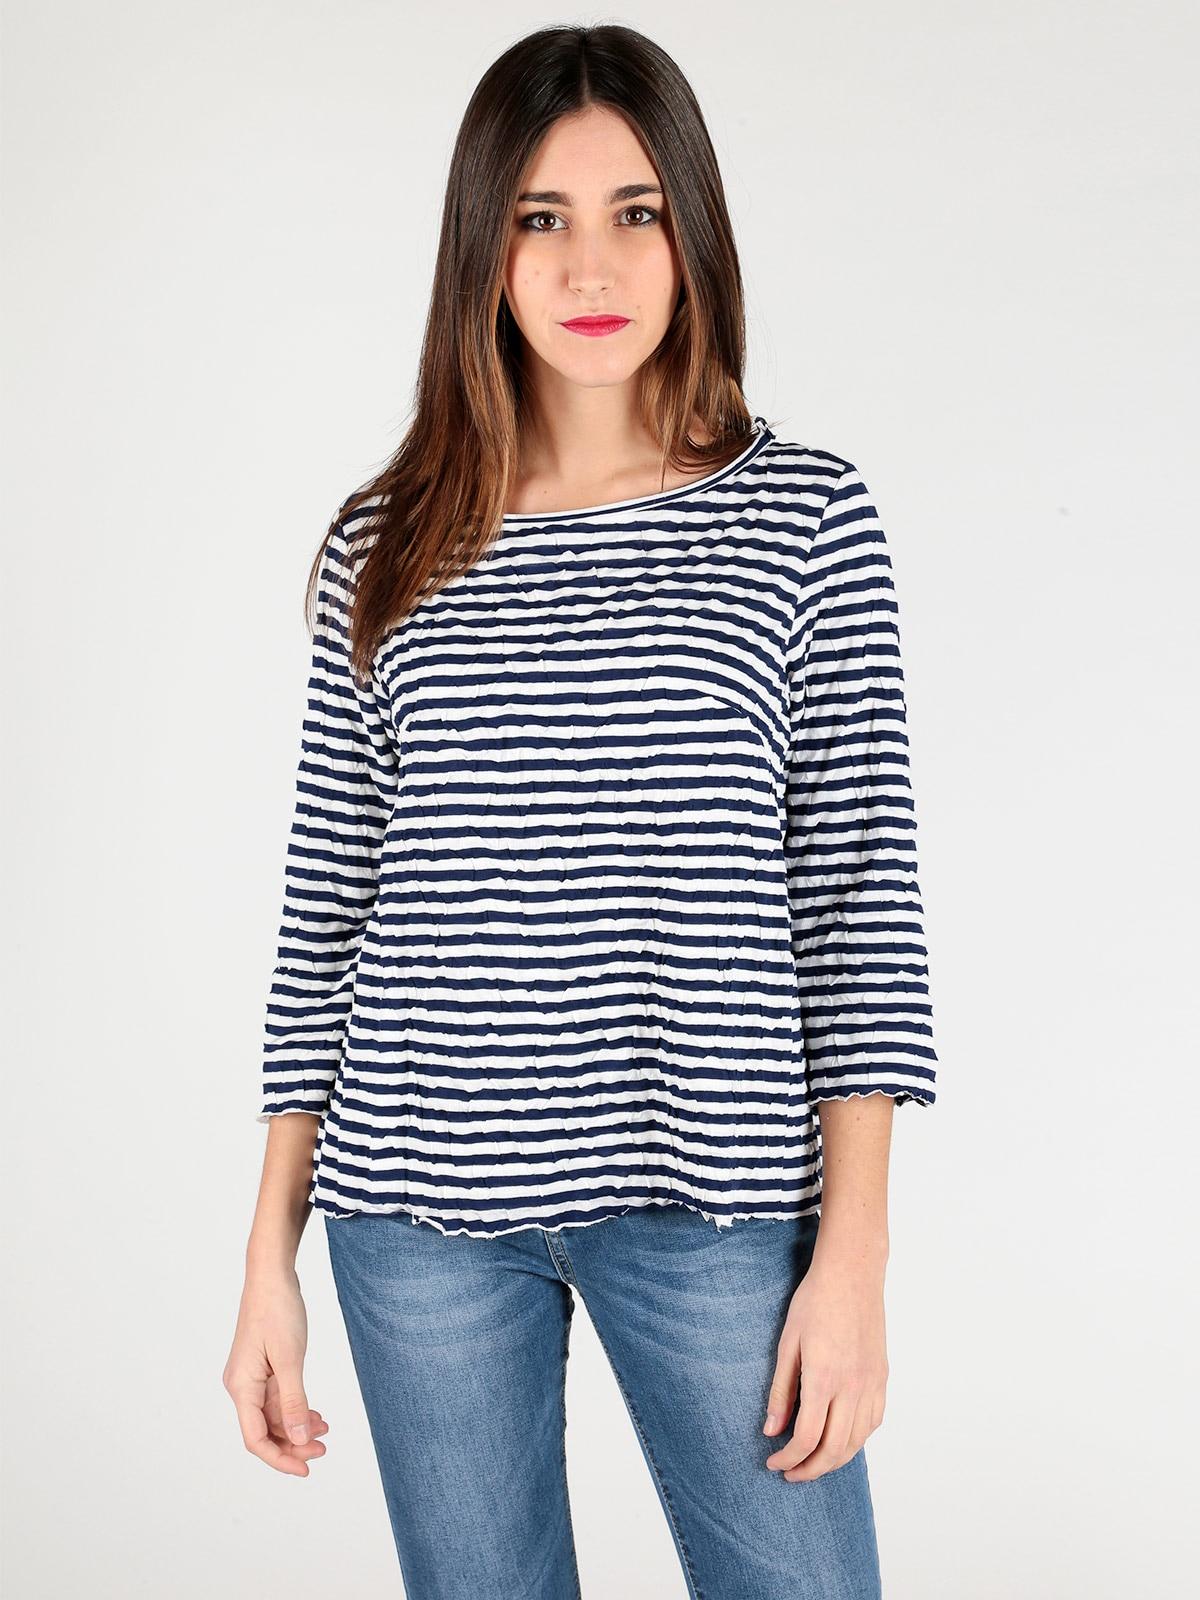 Black White stripe loose o neck long sleeve bottoming shirt tops